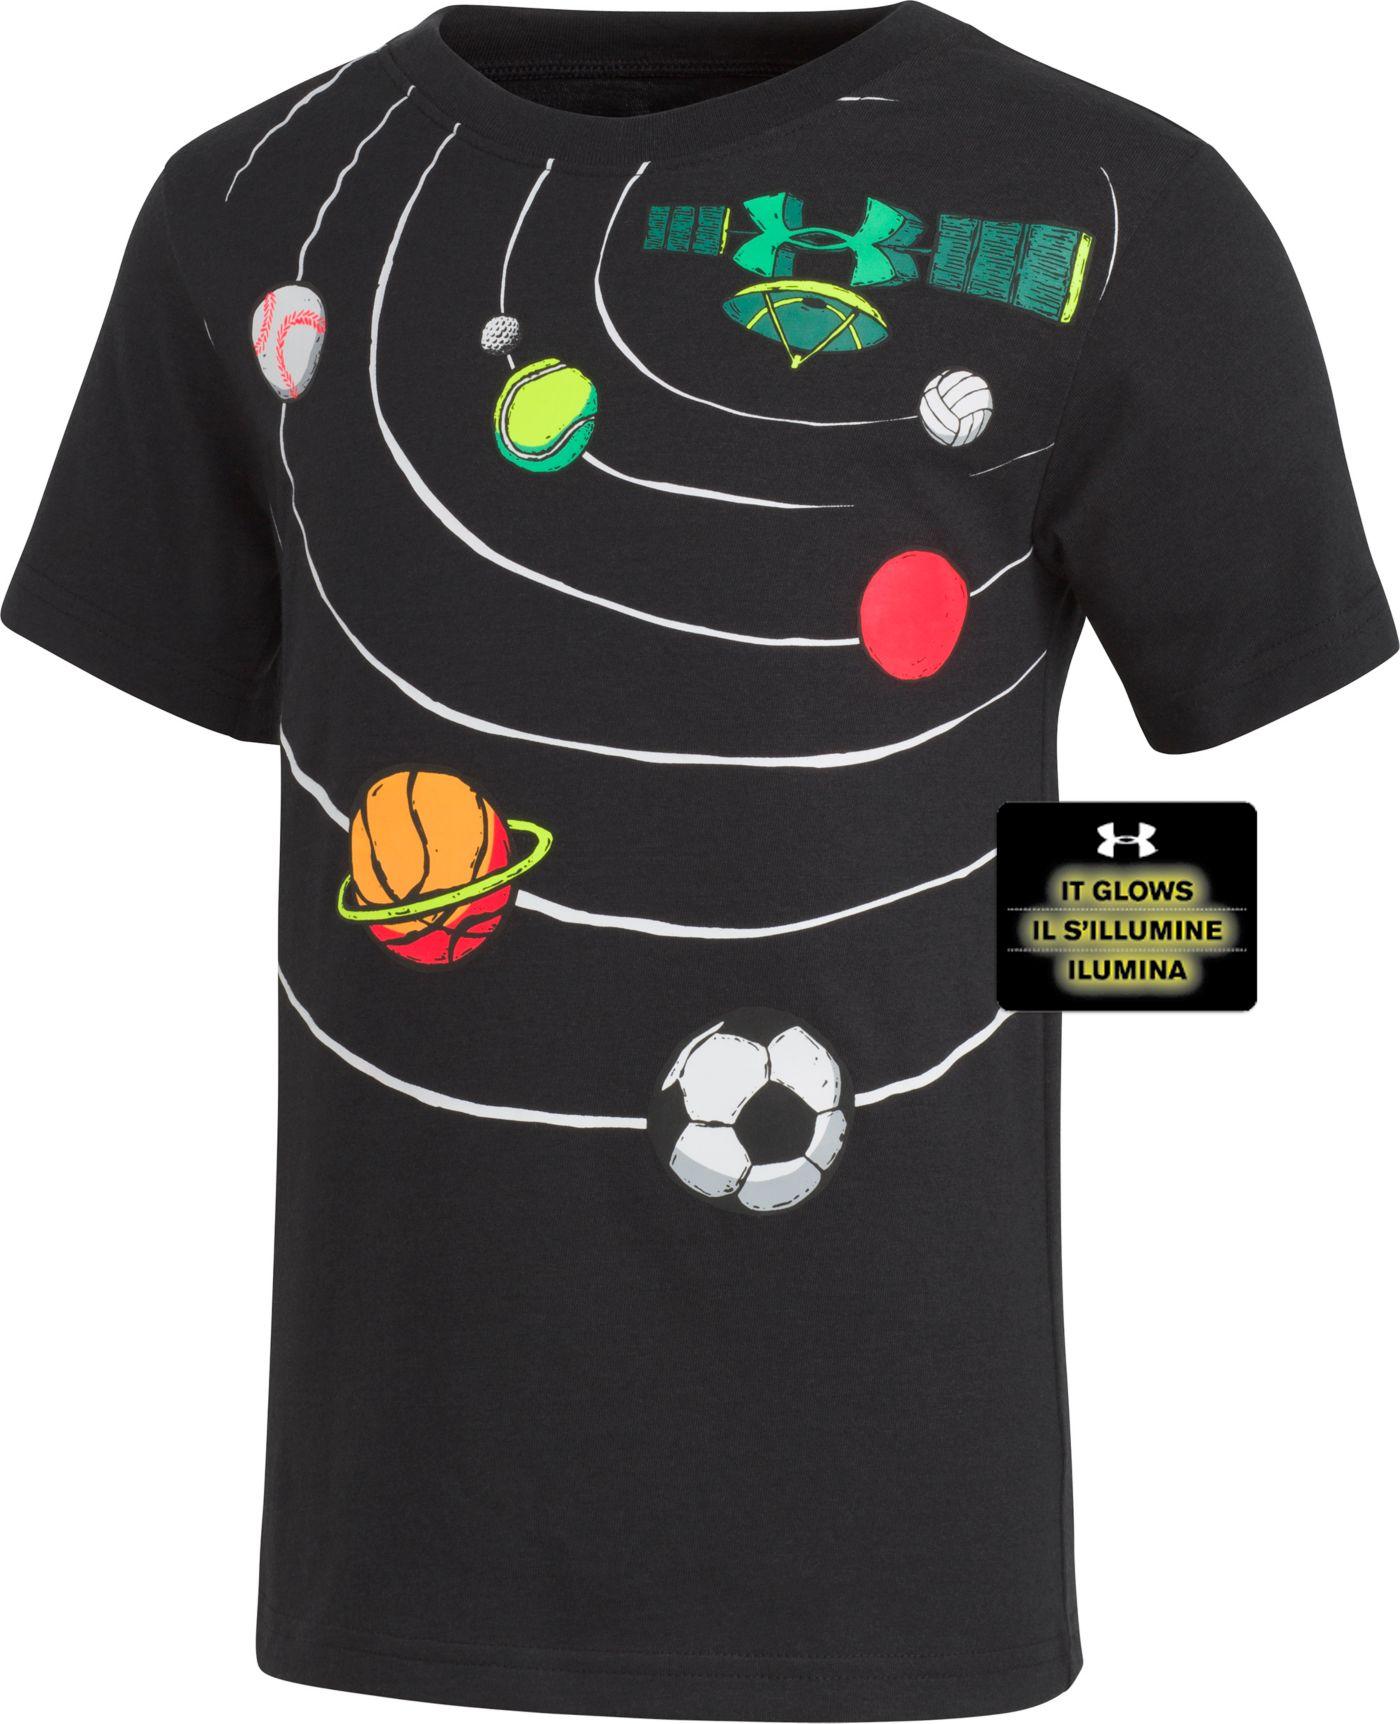 Under Armour Little Boys' Orbit Graphic T-Shirt